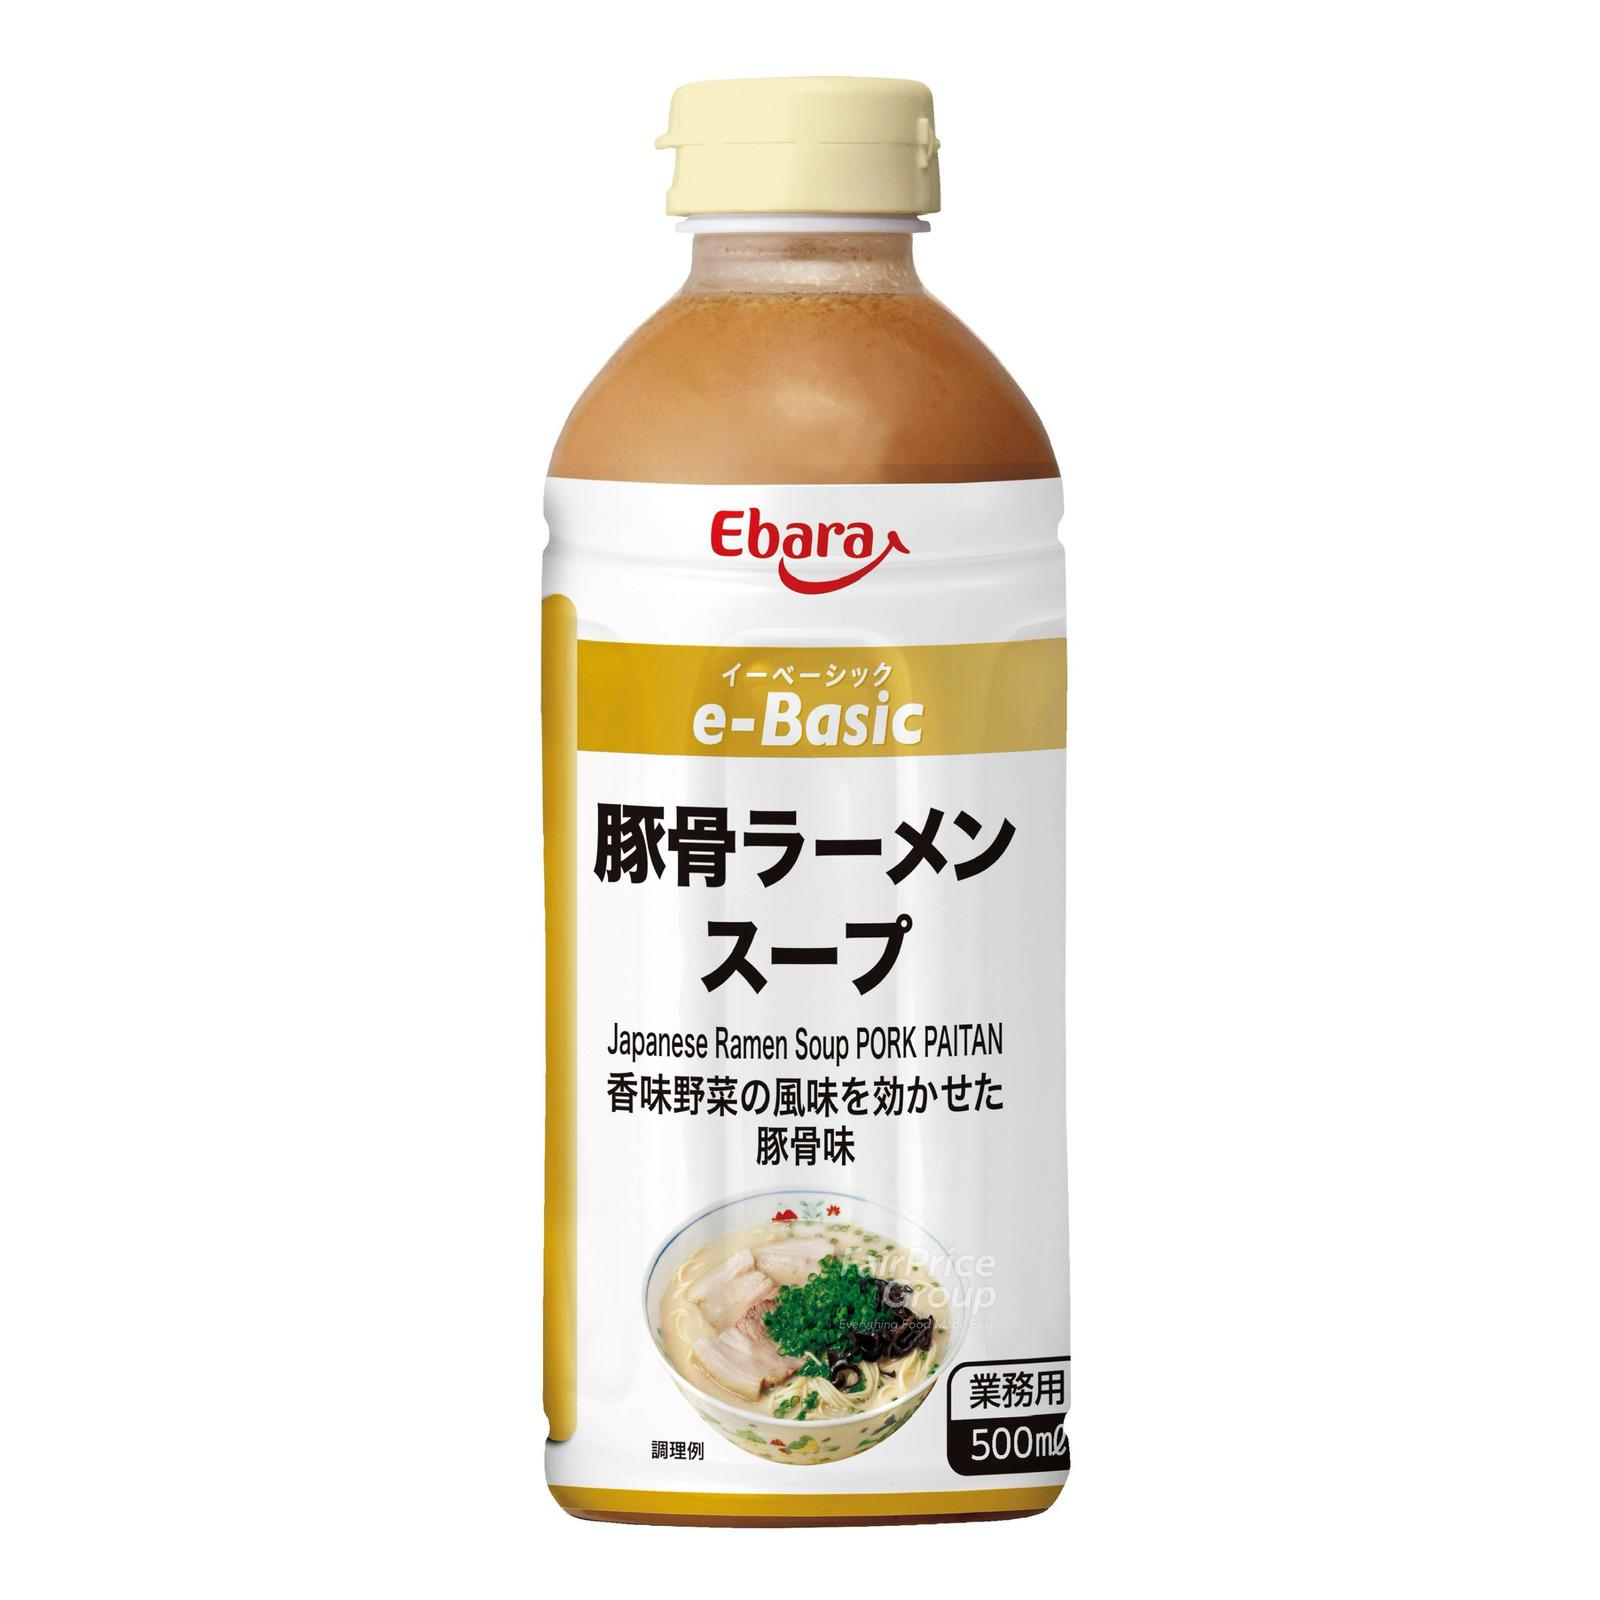 Ebara E-Basic Ramen Bottle Soup Base - Pork Ribs